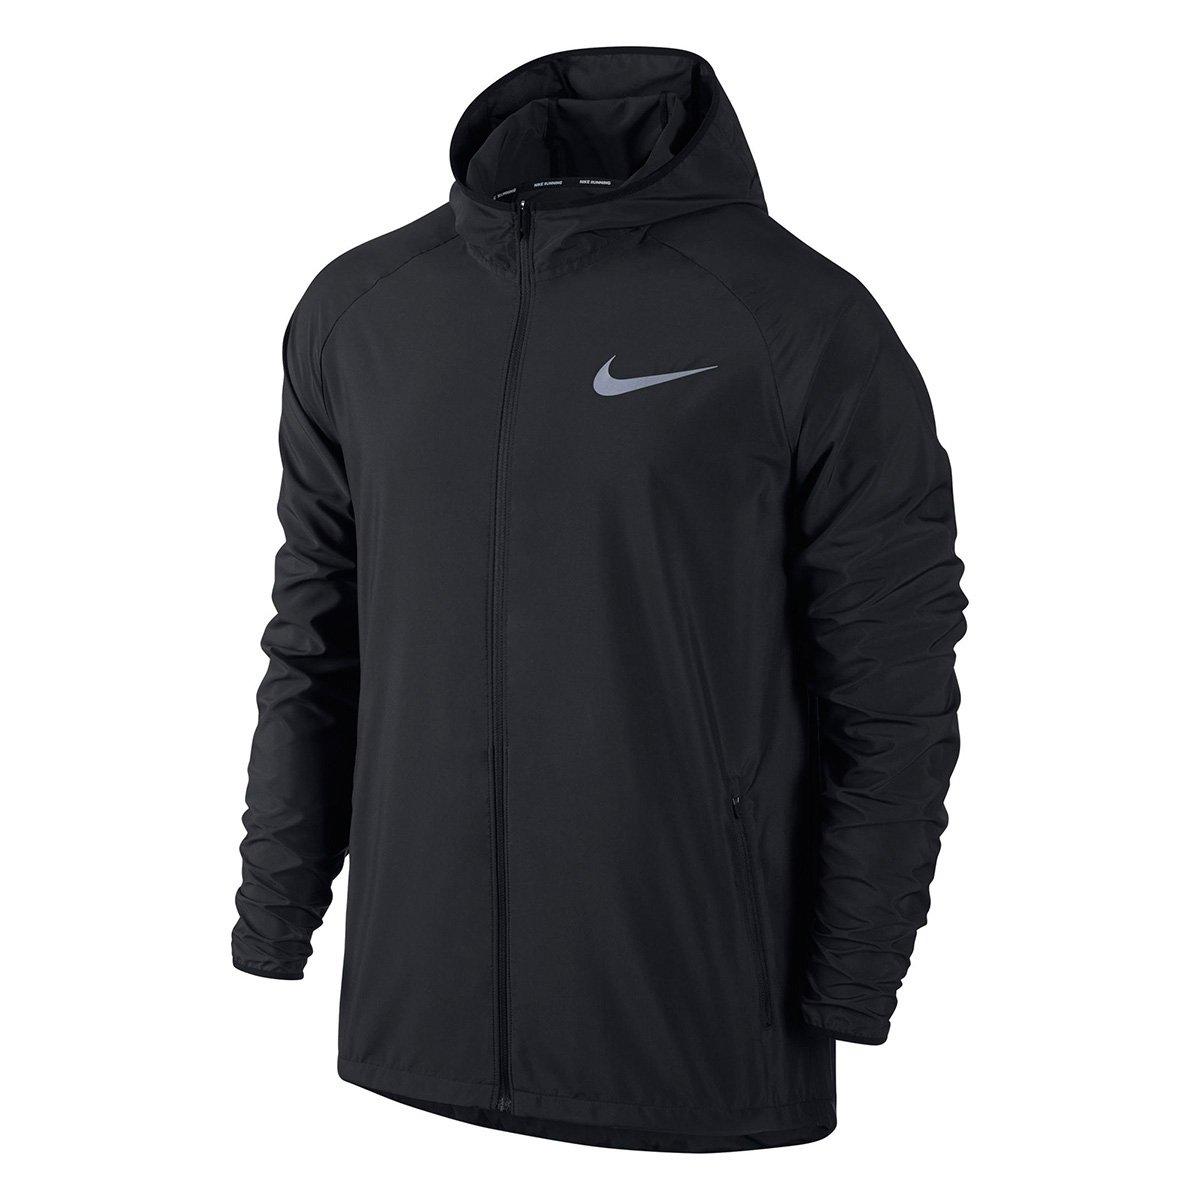 Jaqueta Nike Essential HD Masculina - Compre Agora  2a7b7cad37b44